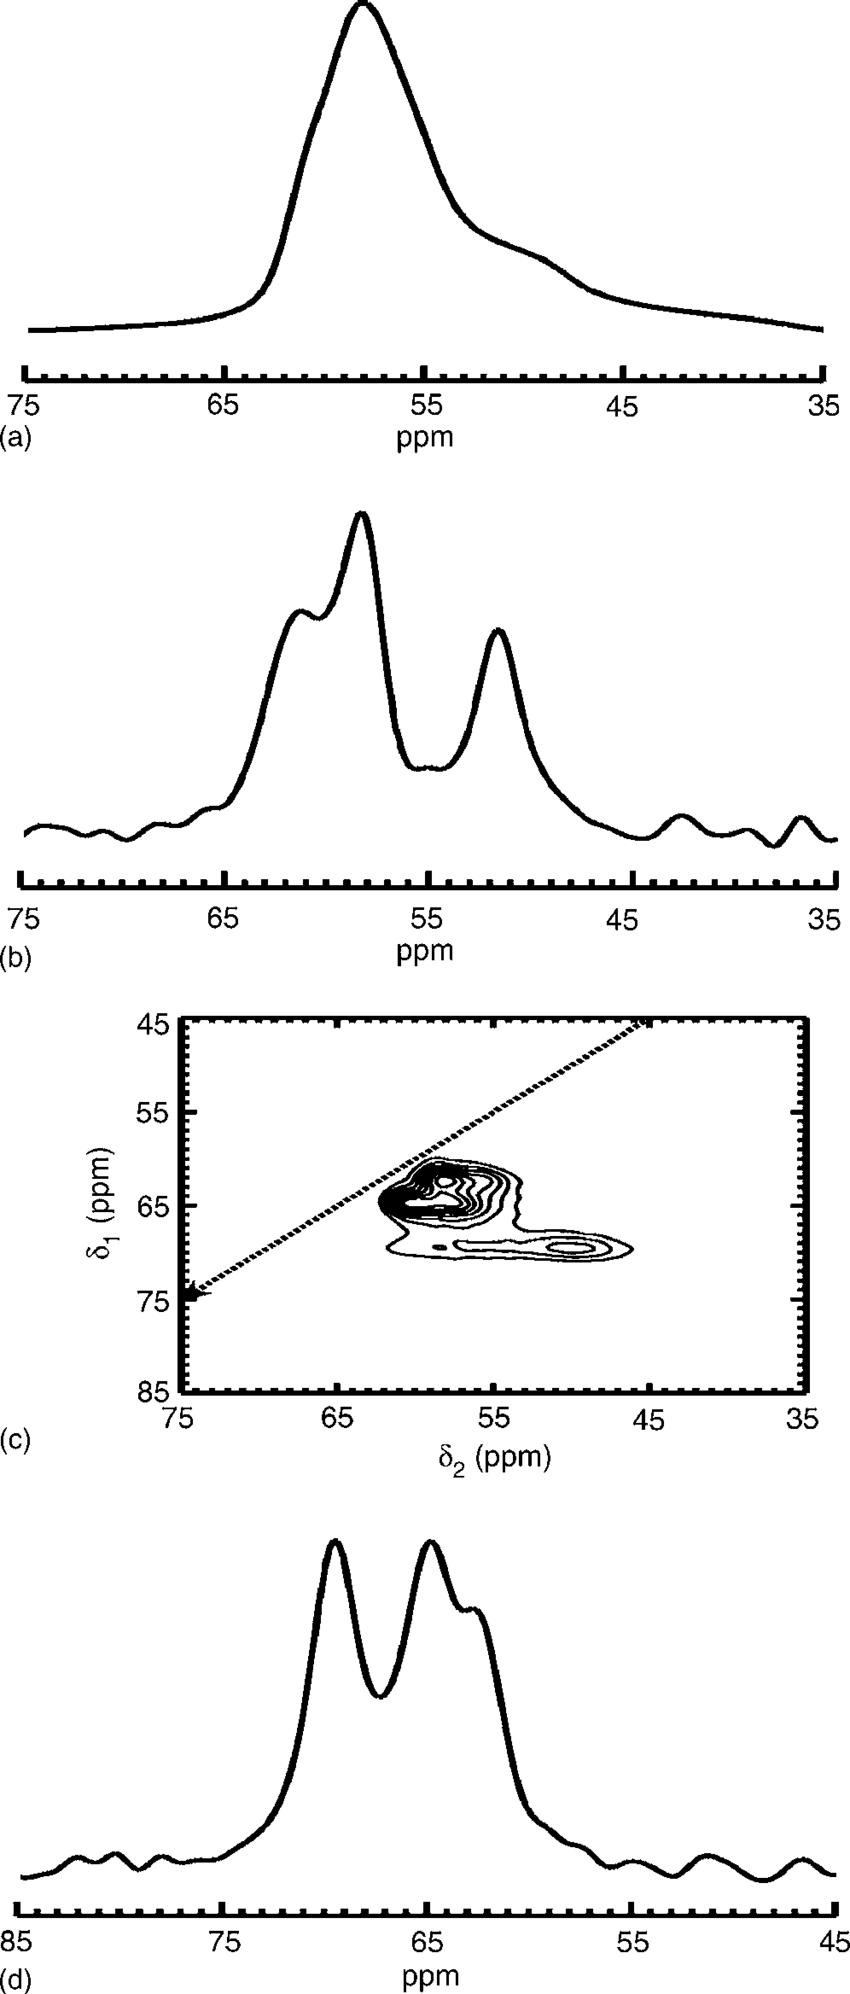 hight resolution of a 27 al mas spectrum of a powdered mesolite sample b 27 al mas download scientific diagram